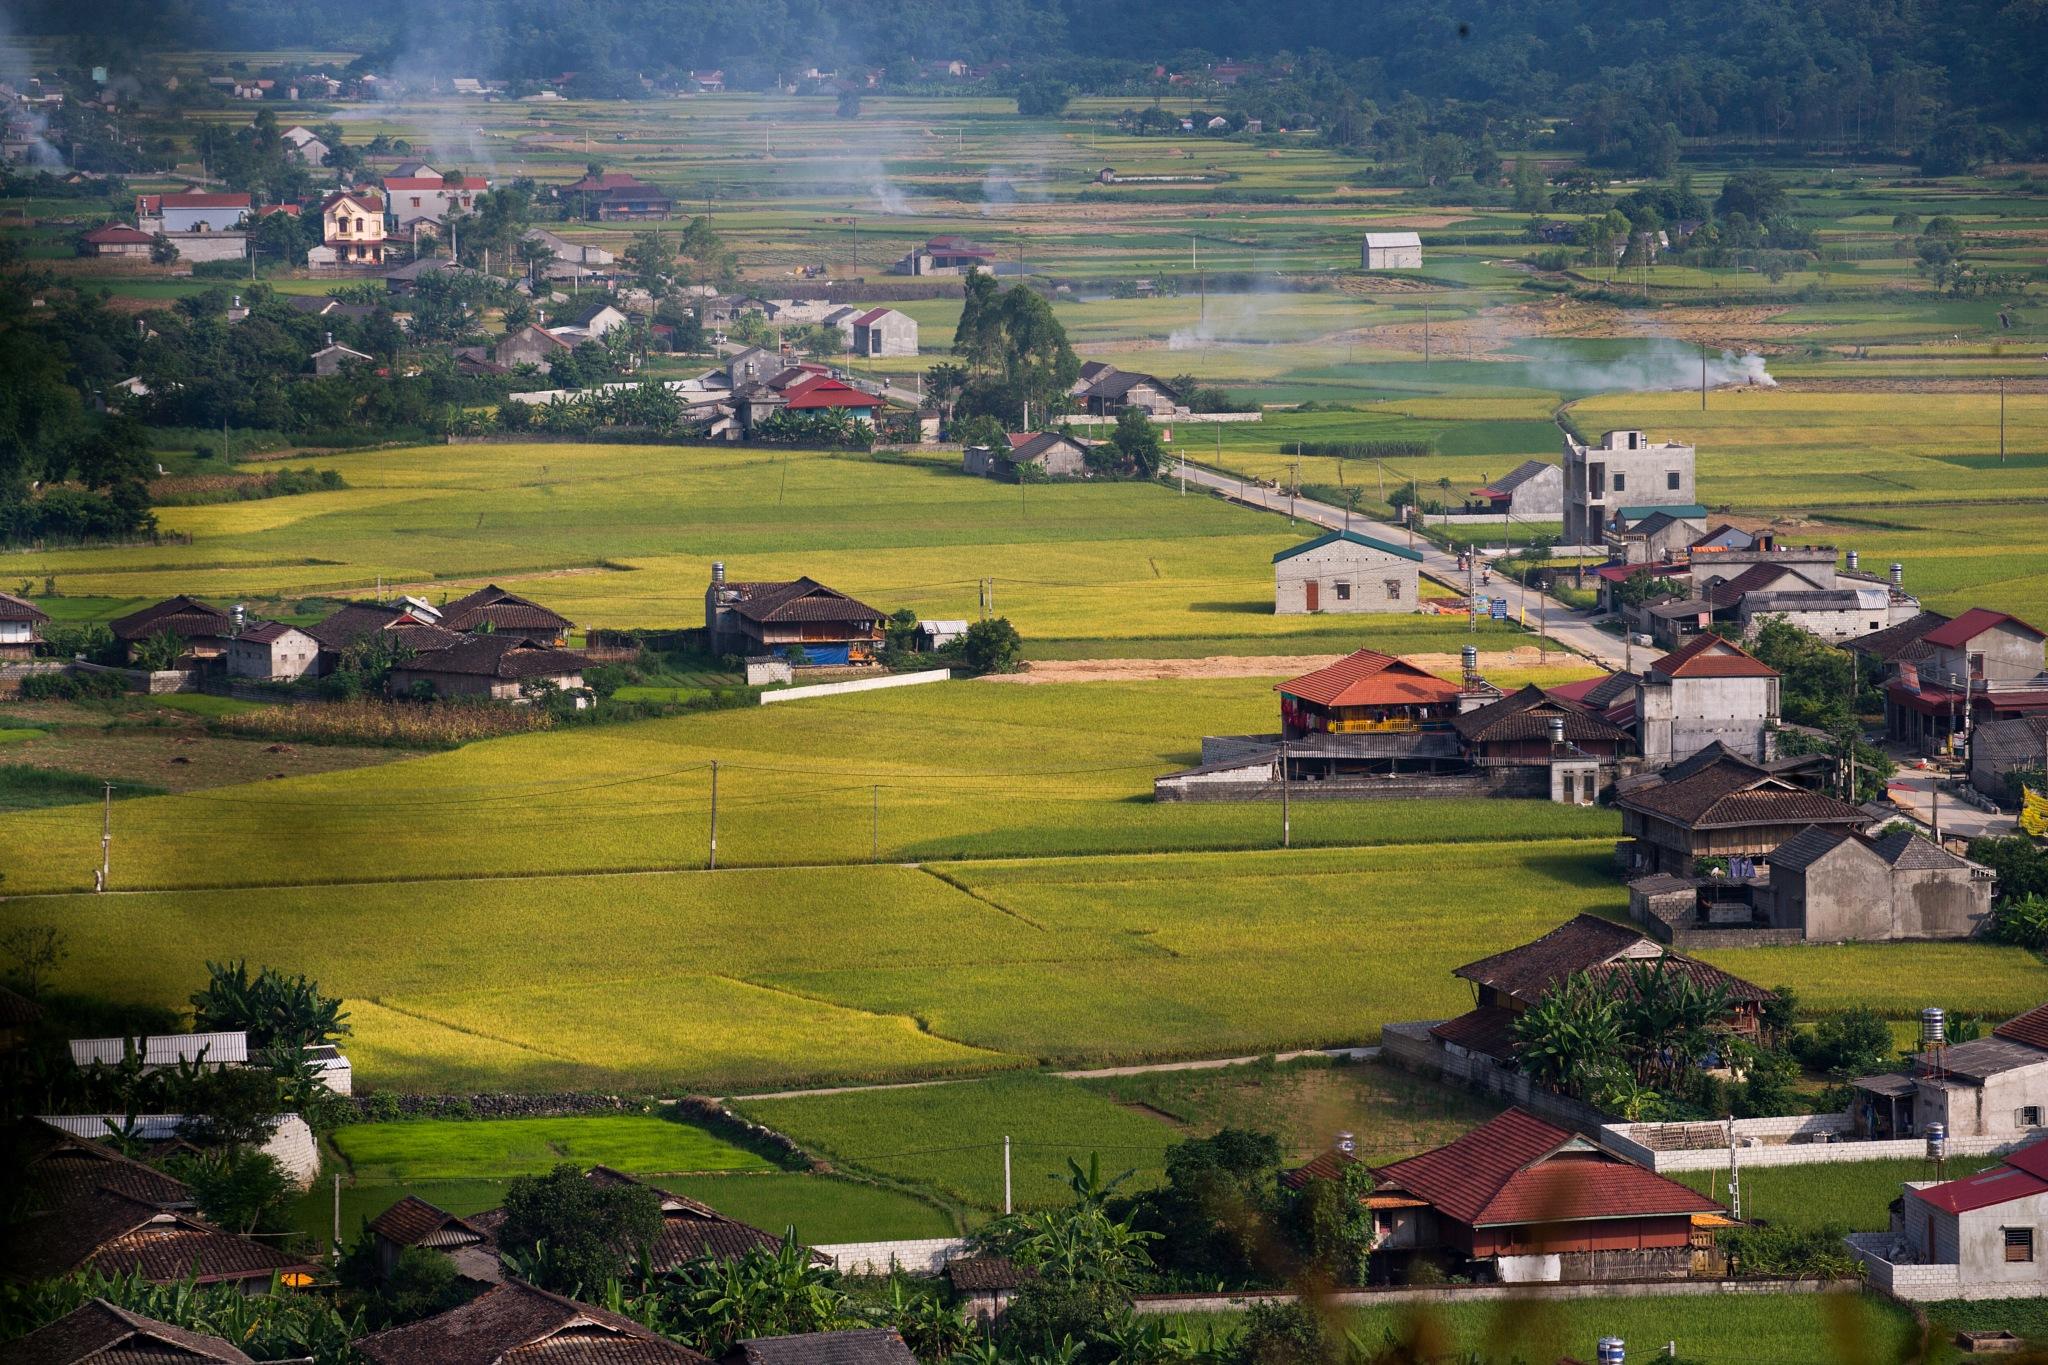 Bac son - lang son - Vietnam by xuanduongvan